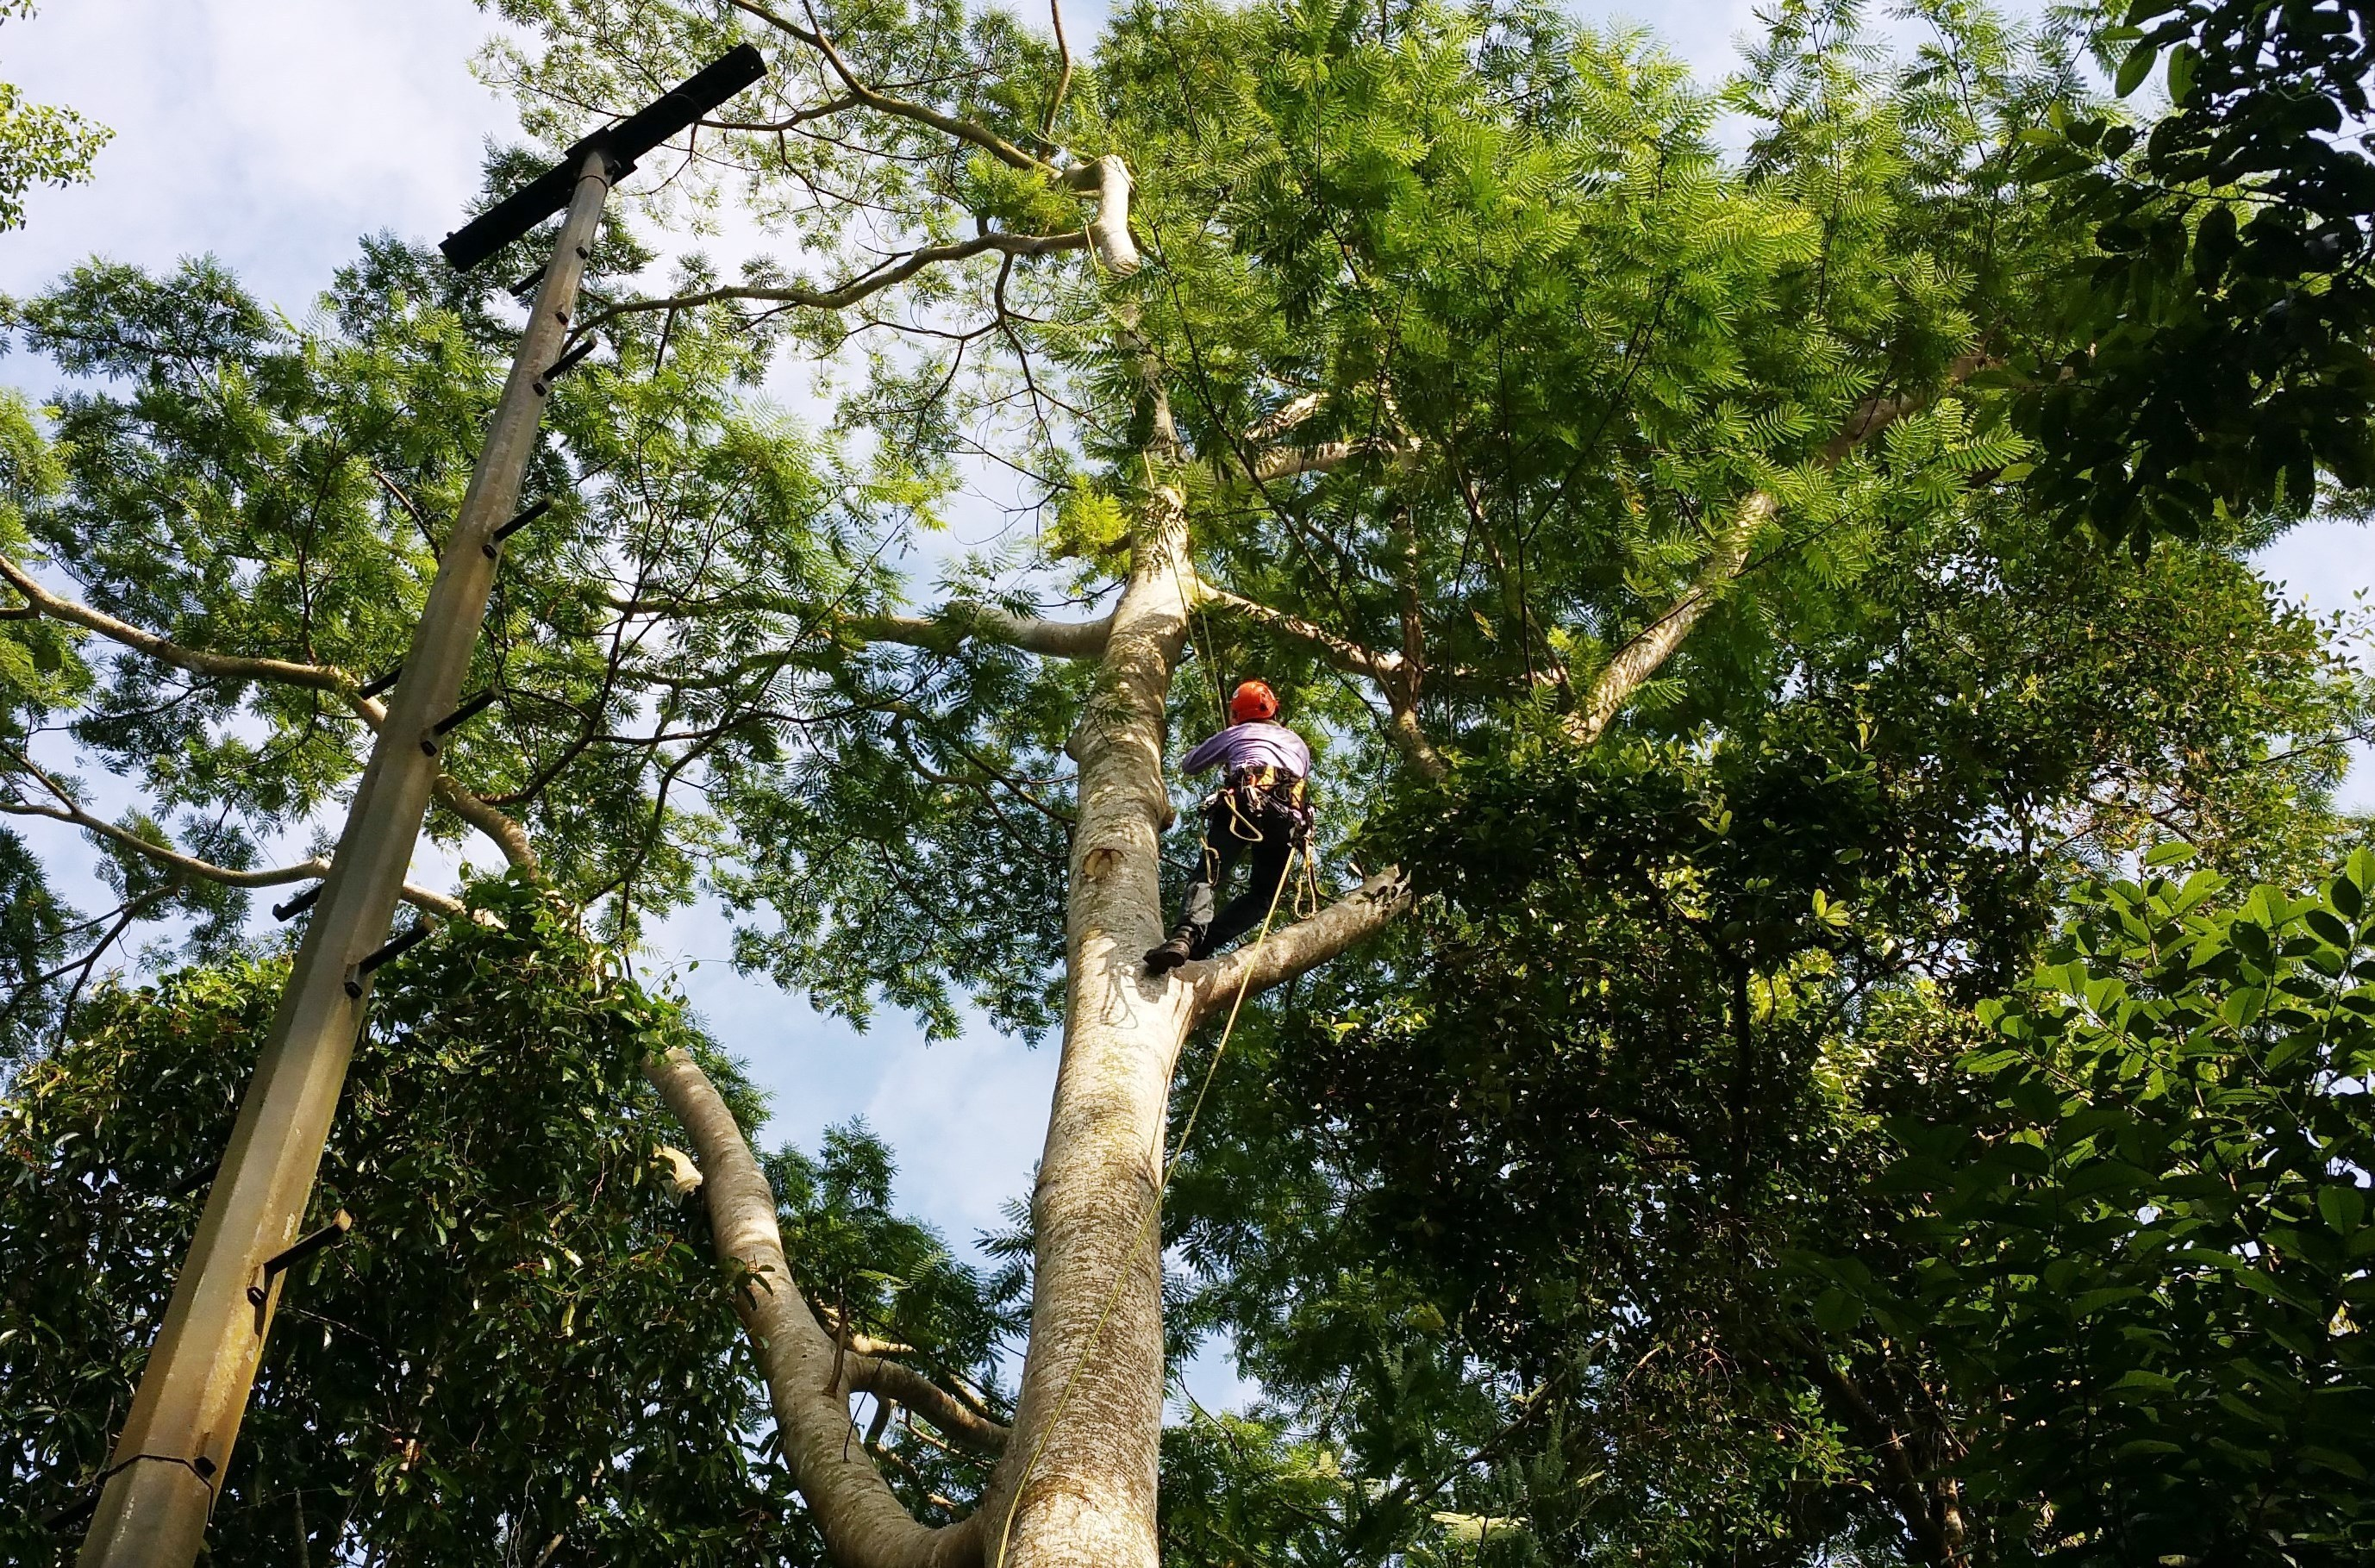 Aguilar Tree Service